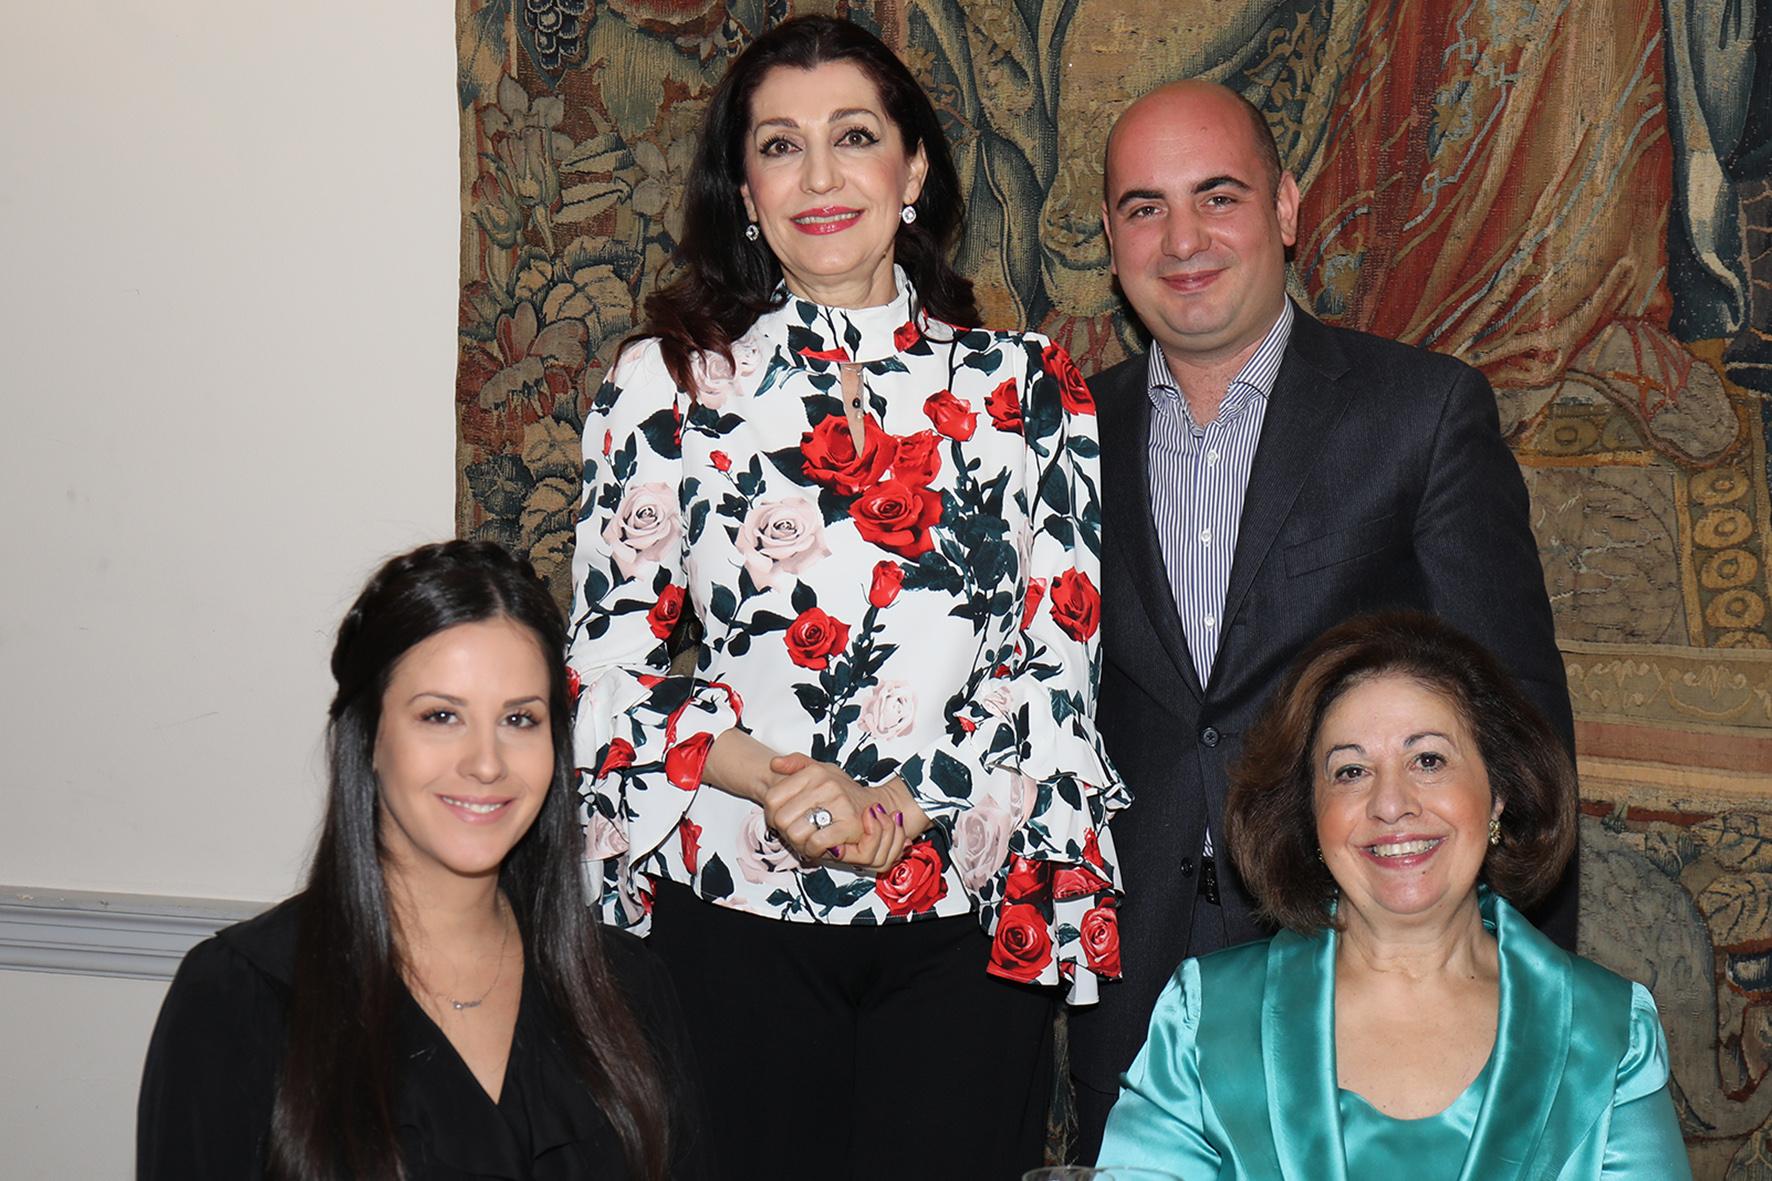 HRH with Mrs. Tamara Vucic, first lady, opera singer Jadranka Jovanovic and guitarist Nemanja Bogunovic